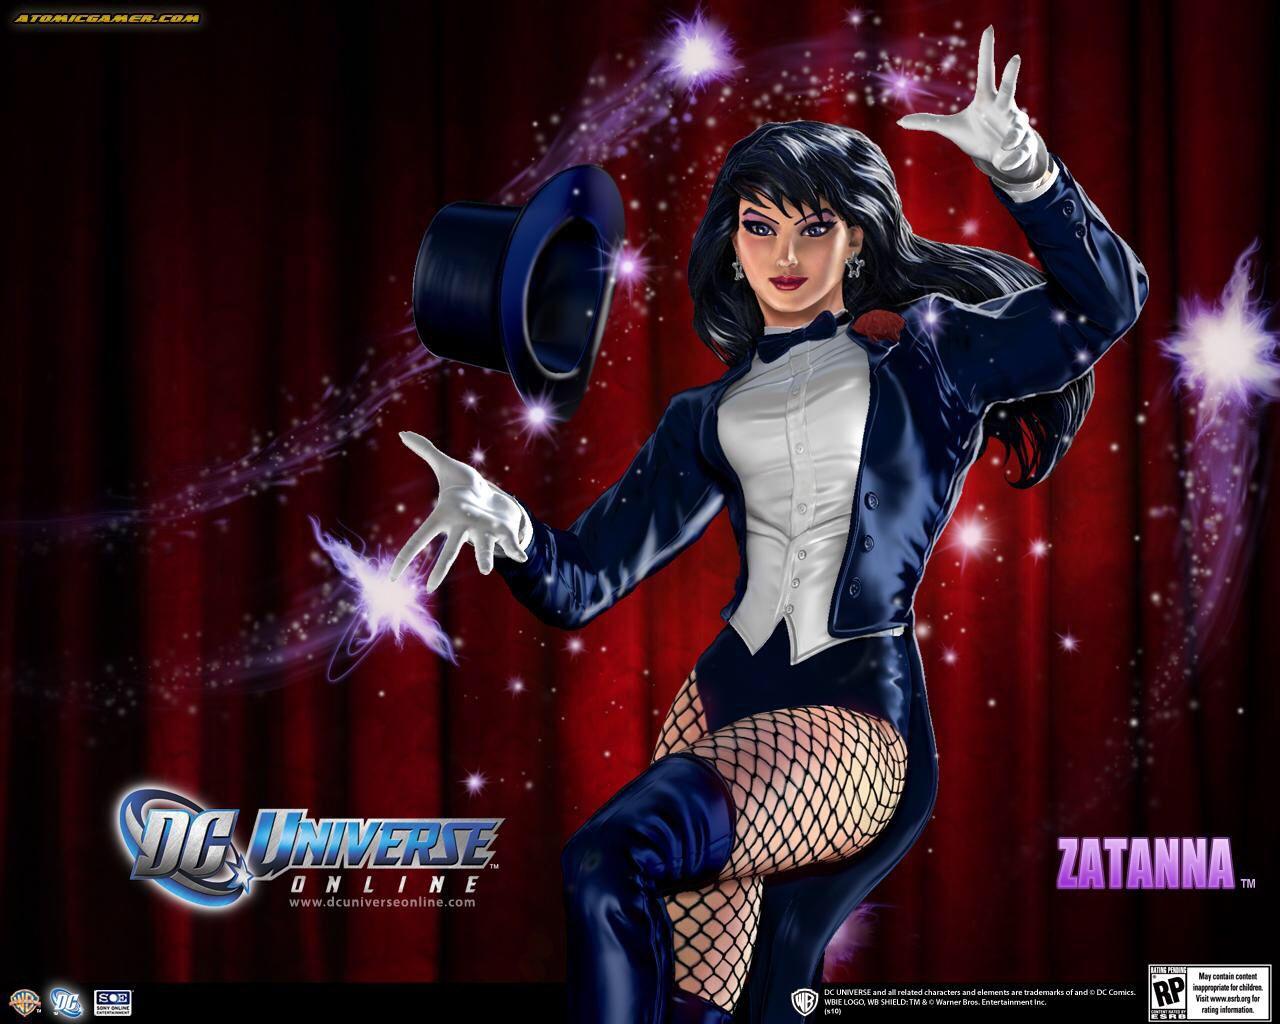 Zatanna Dc Universe Online Dc Comics Wallpaper Dc Heroes Dc Universe Online